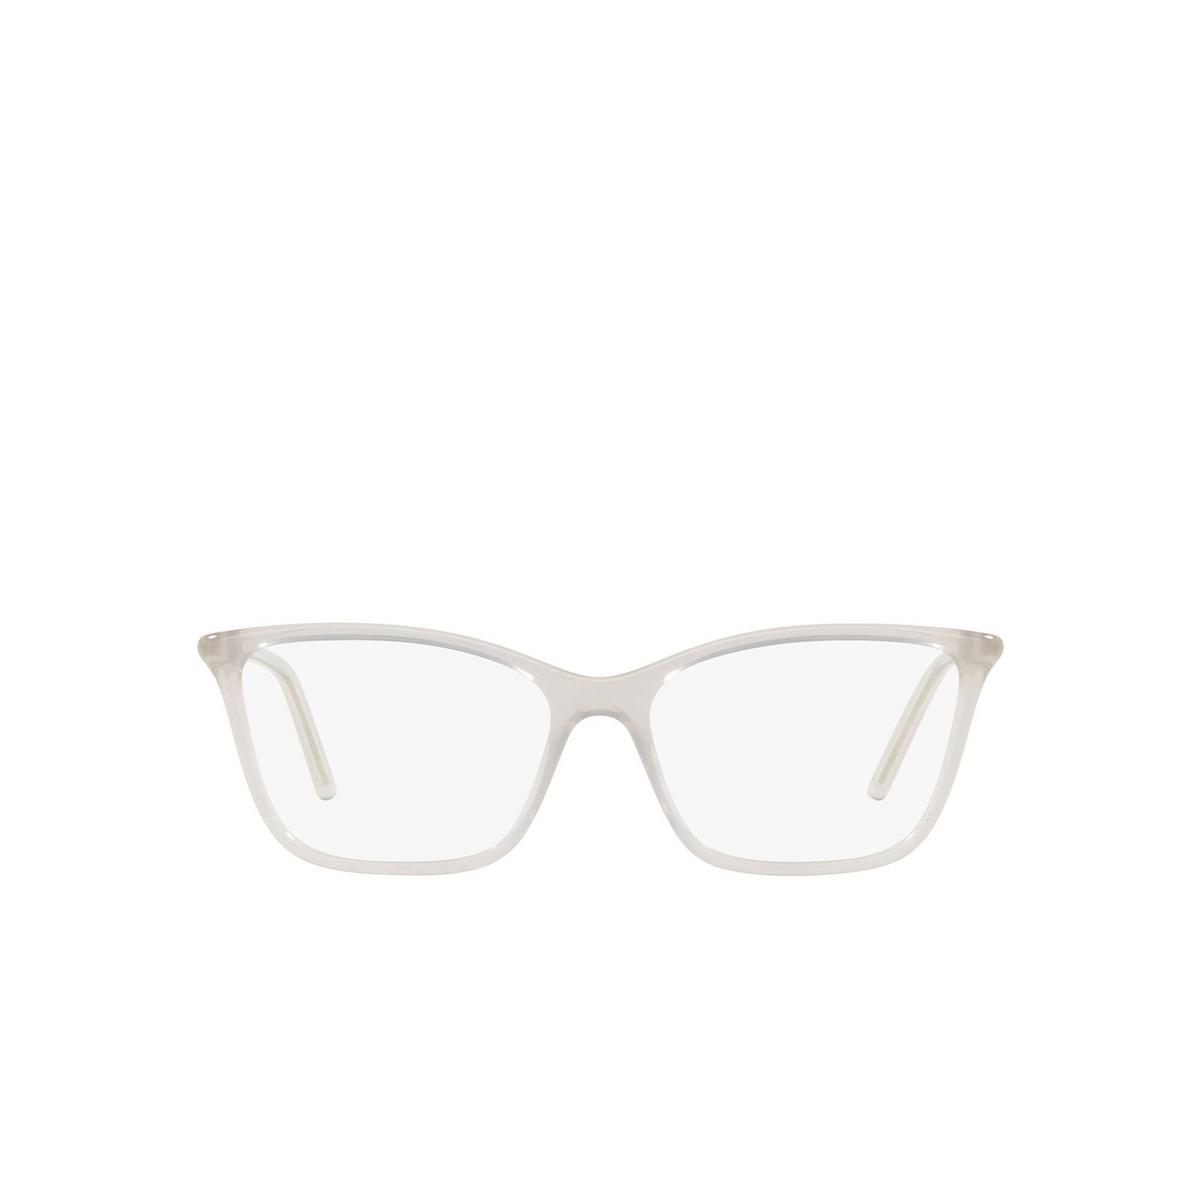 Prada® Cat-eye Eyeglasses: PR 08WV color Opal Grey TWH1O1 - front view.